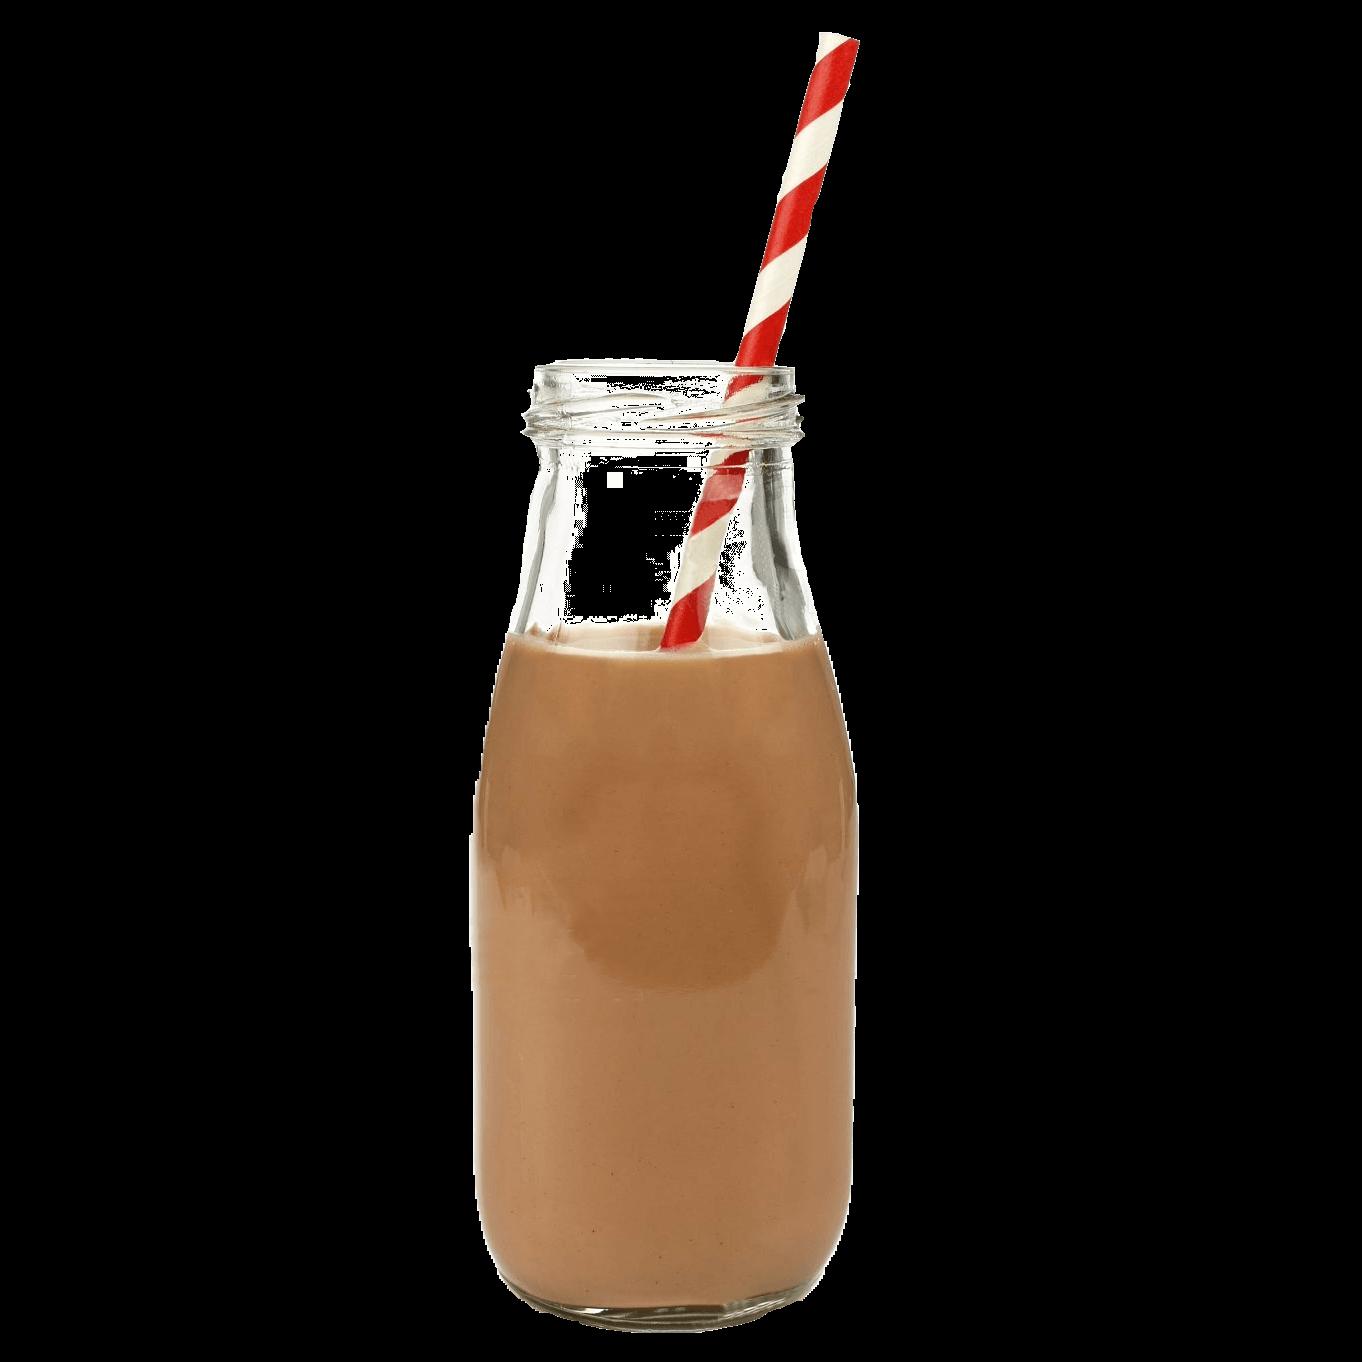 Chocolate-Milk-4.png - PNG Chocolate Milk